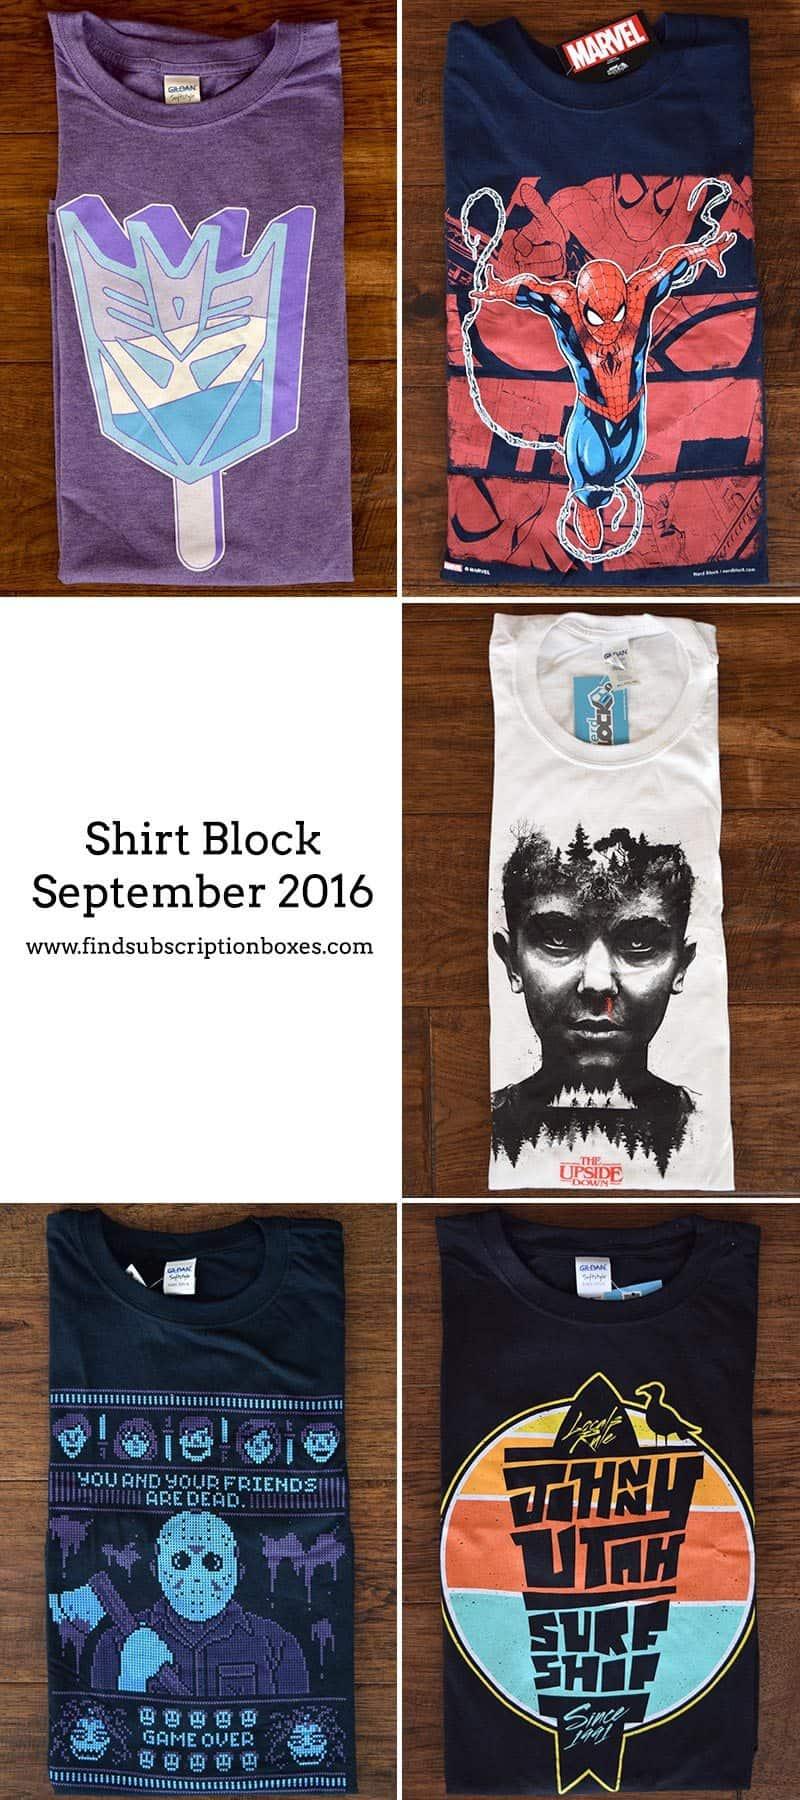 September 2016 Shirt Block Review - Inside the Box